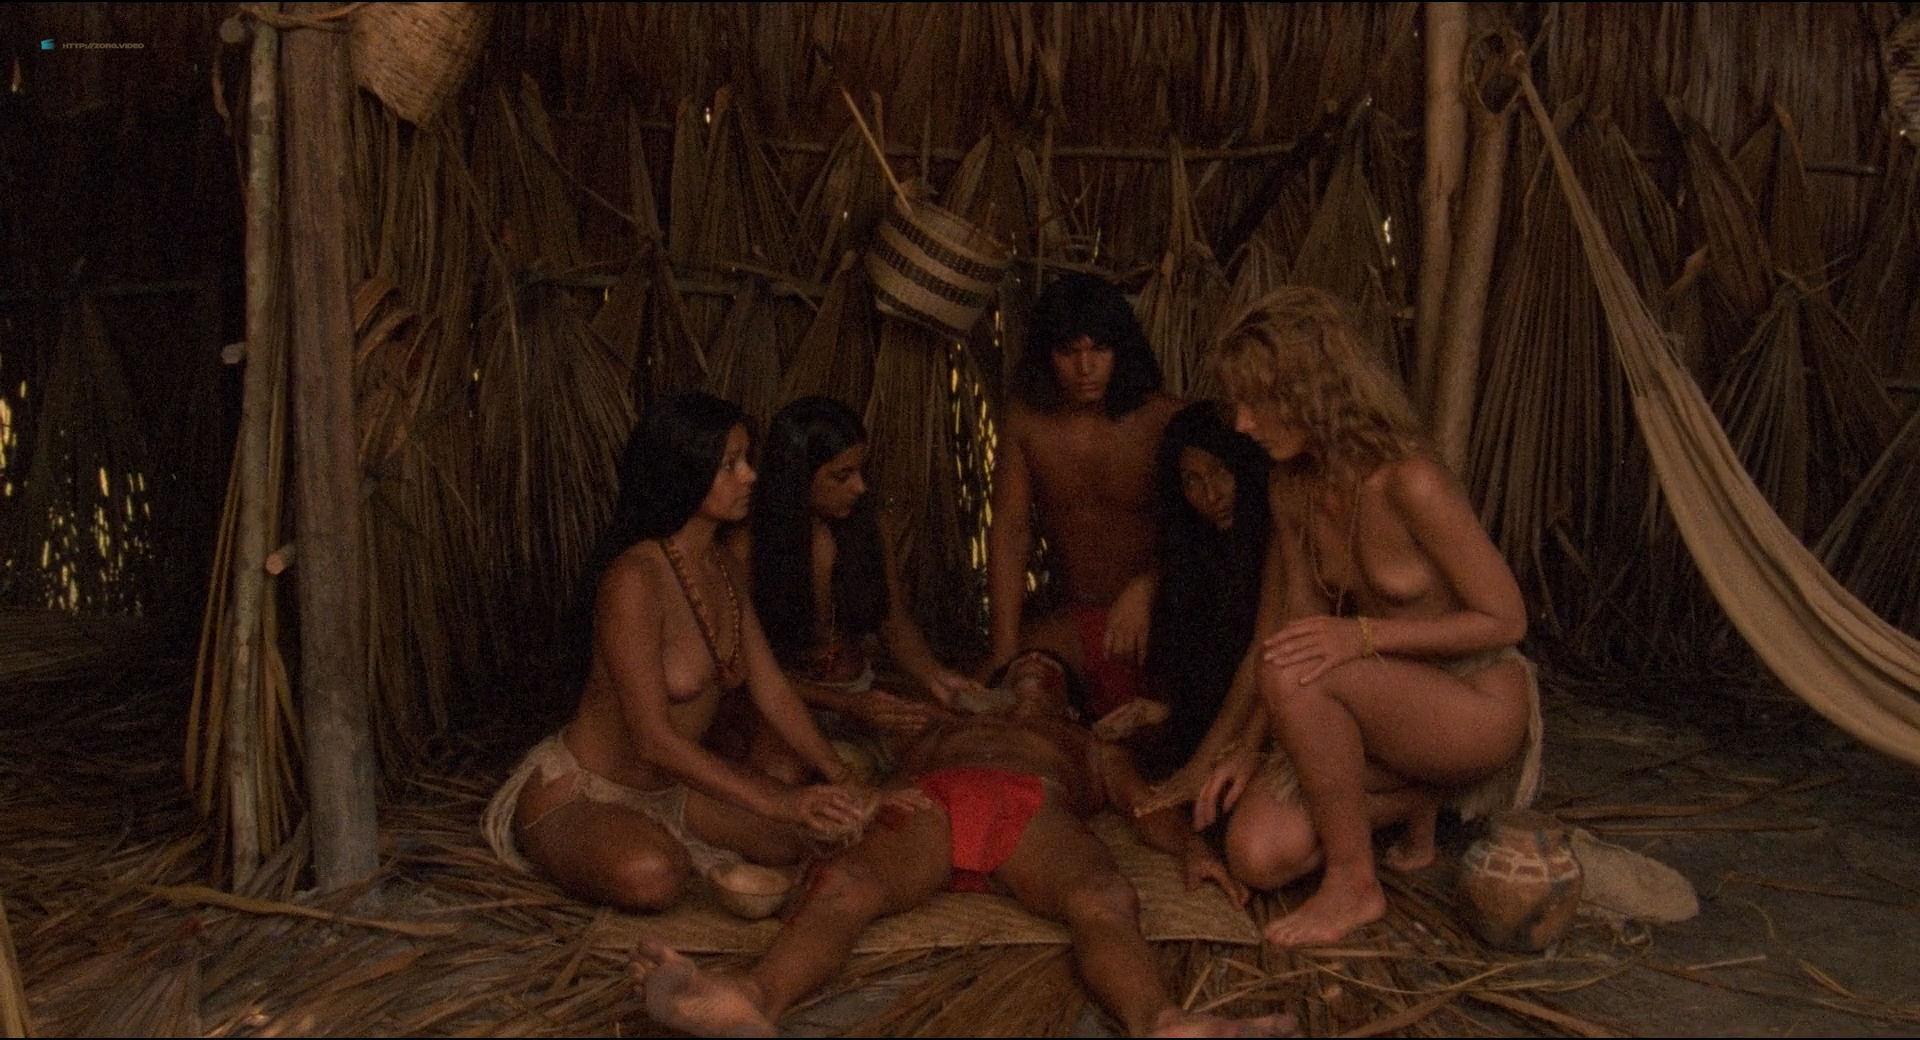 Elvire Audray nude Sara Fleszer, Jessica Bridges all nude full frontal - White Slave (IT-1985) HD 1080p BluRay (8)